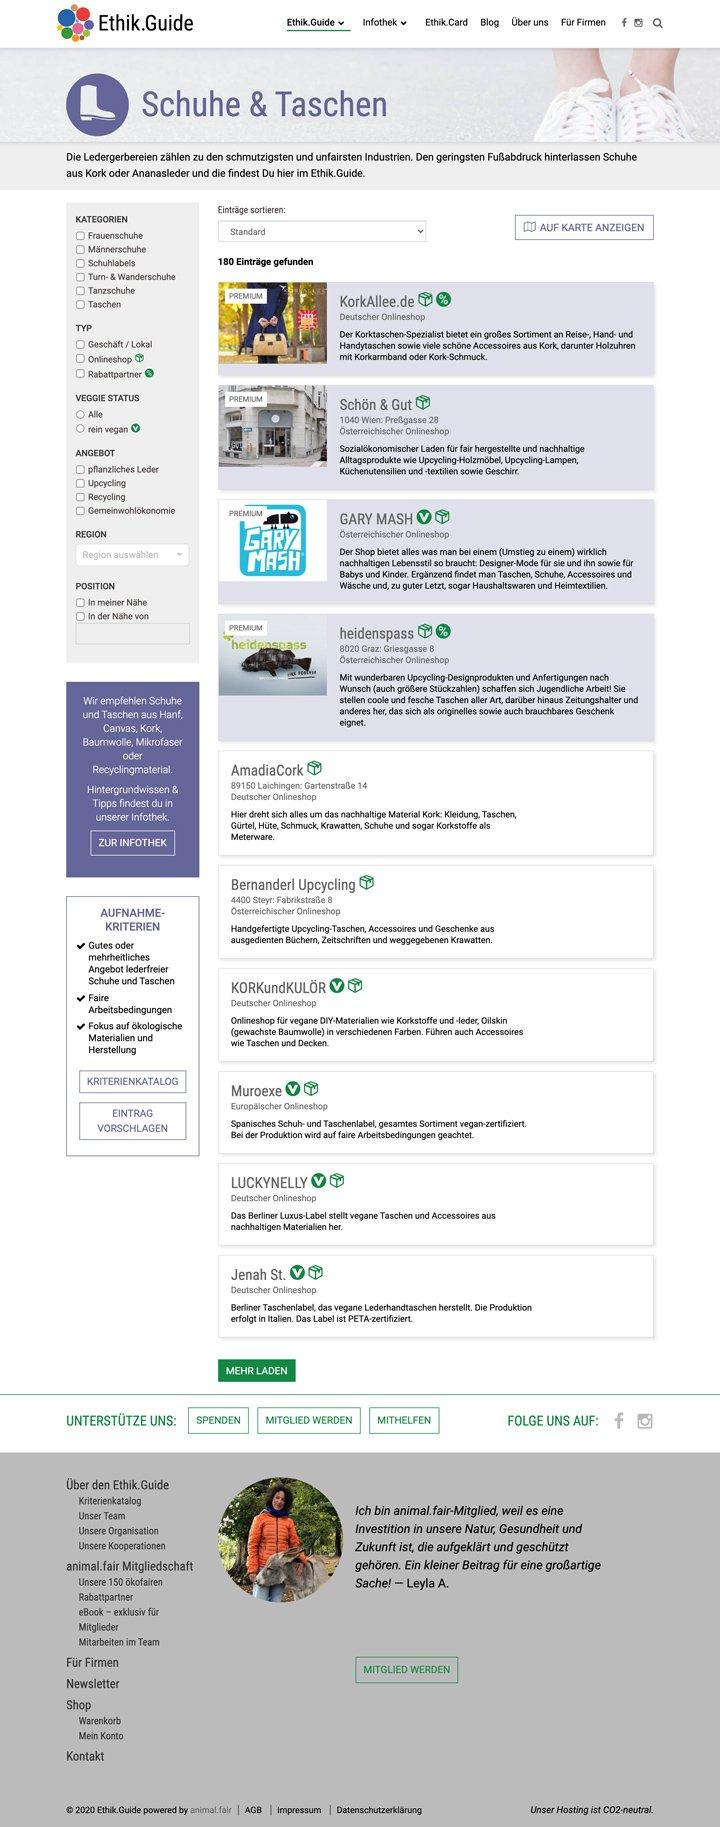 Ethik.Guide Website Screenshot